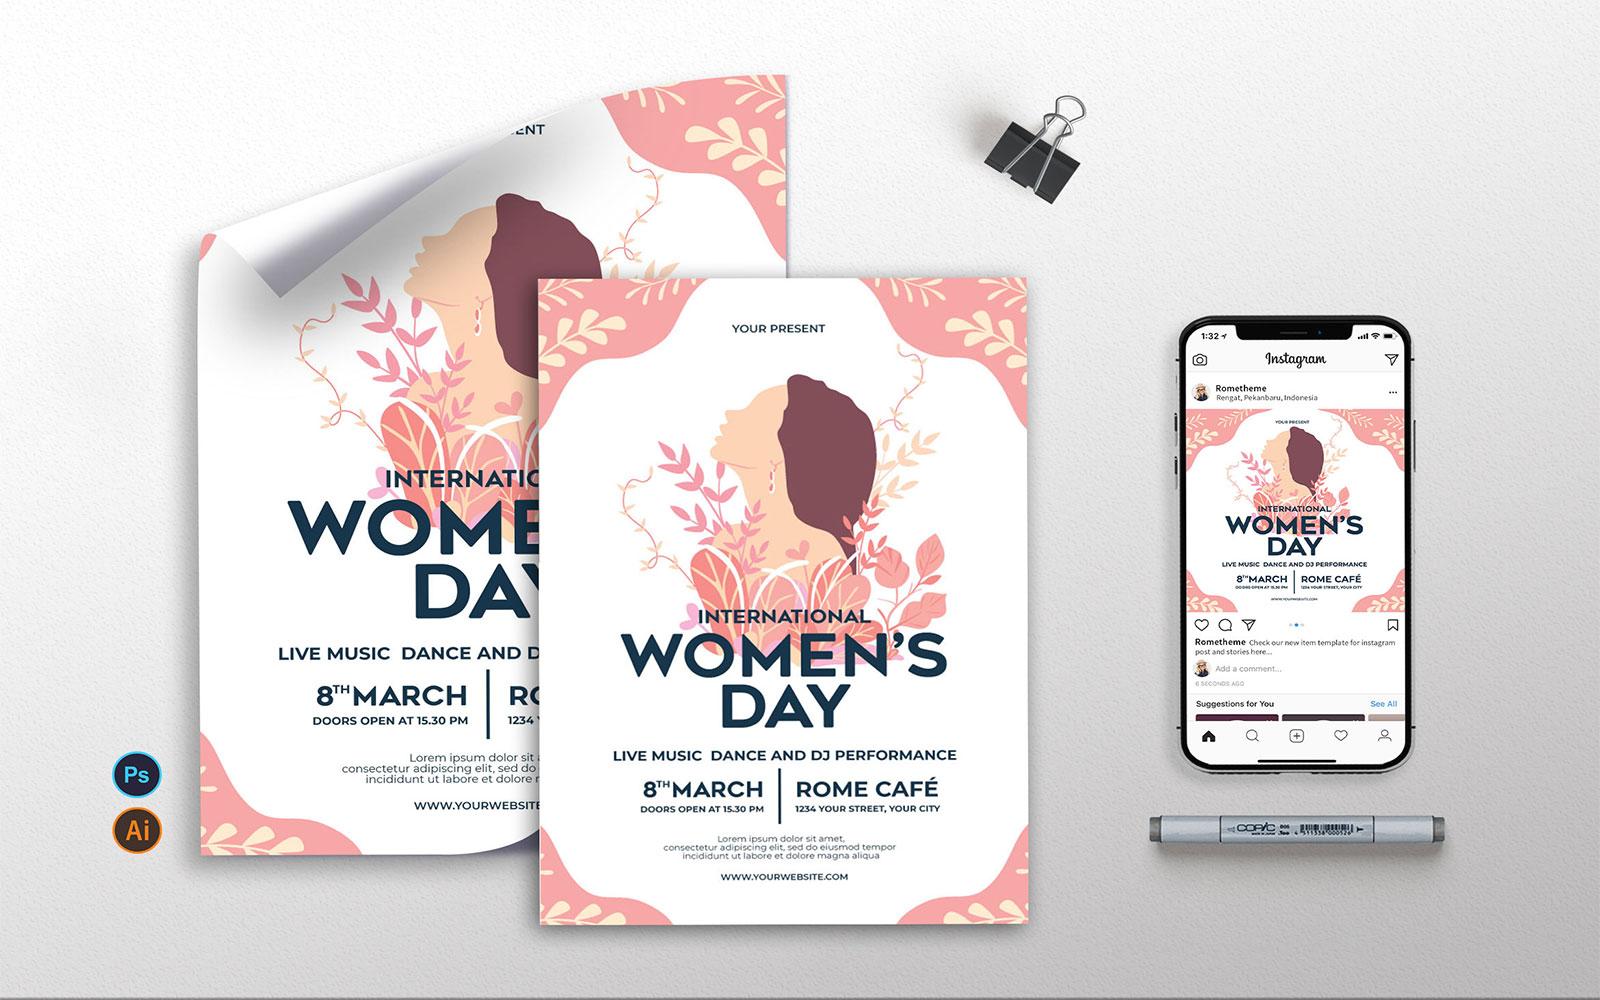 International Womens Day - Flyer, Poster & Instagram Template